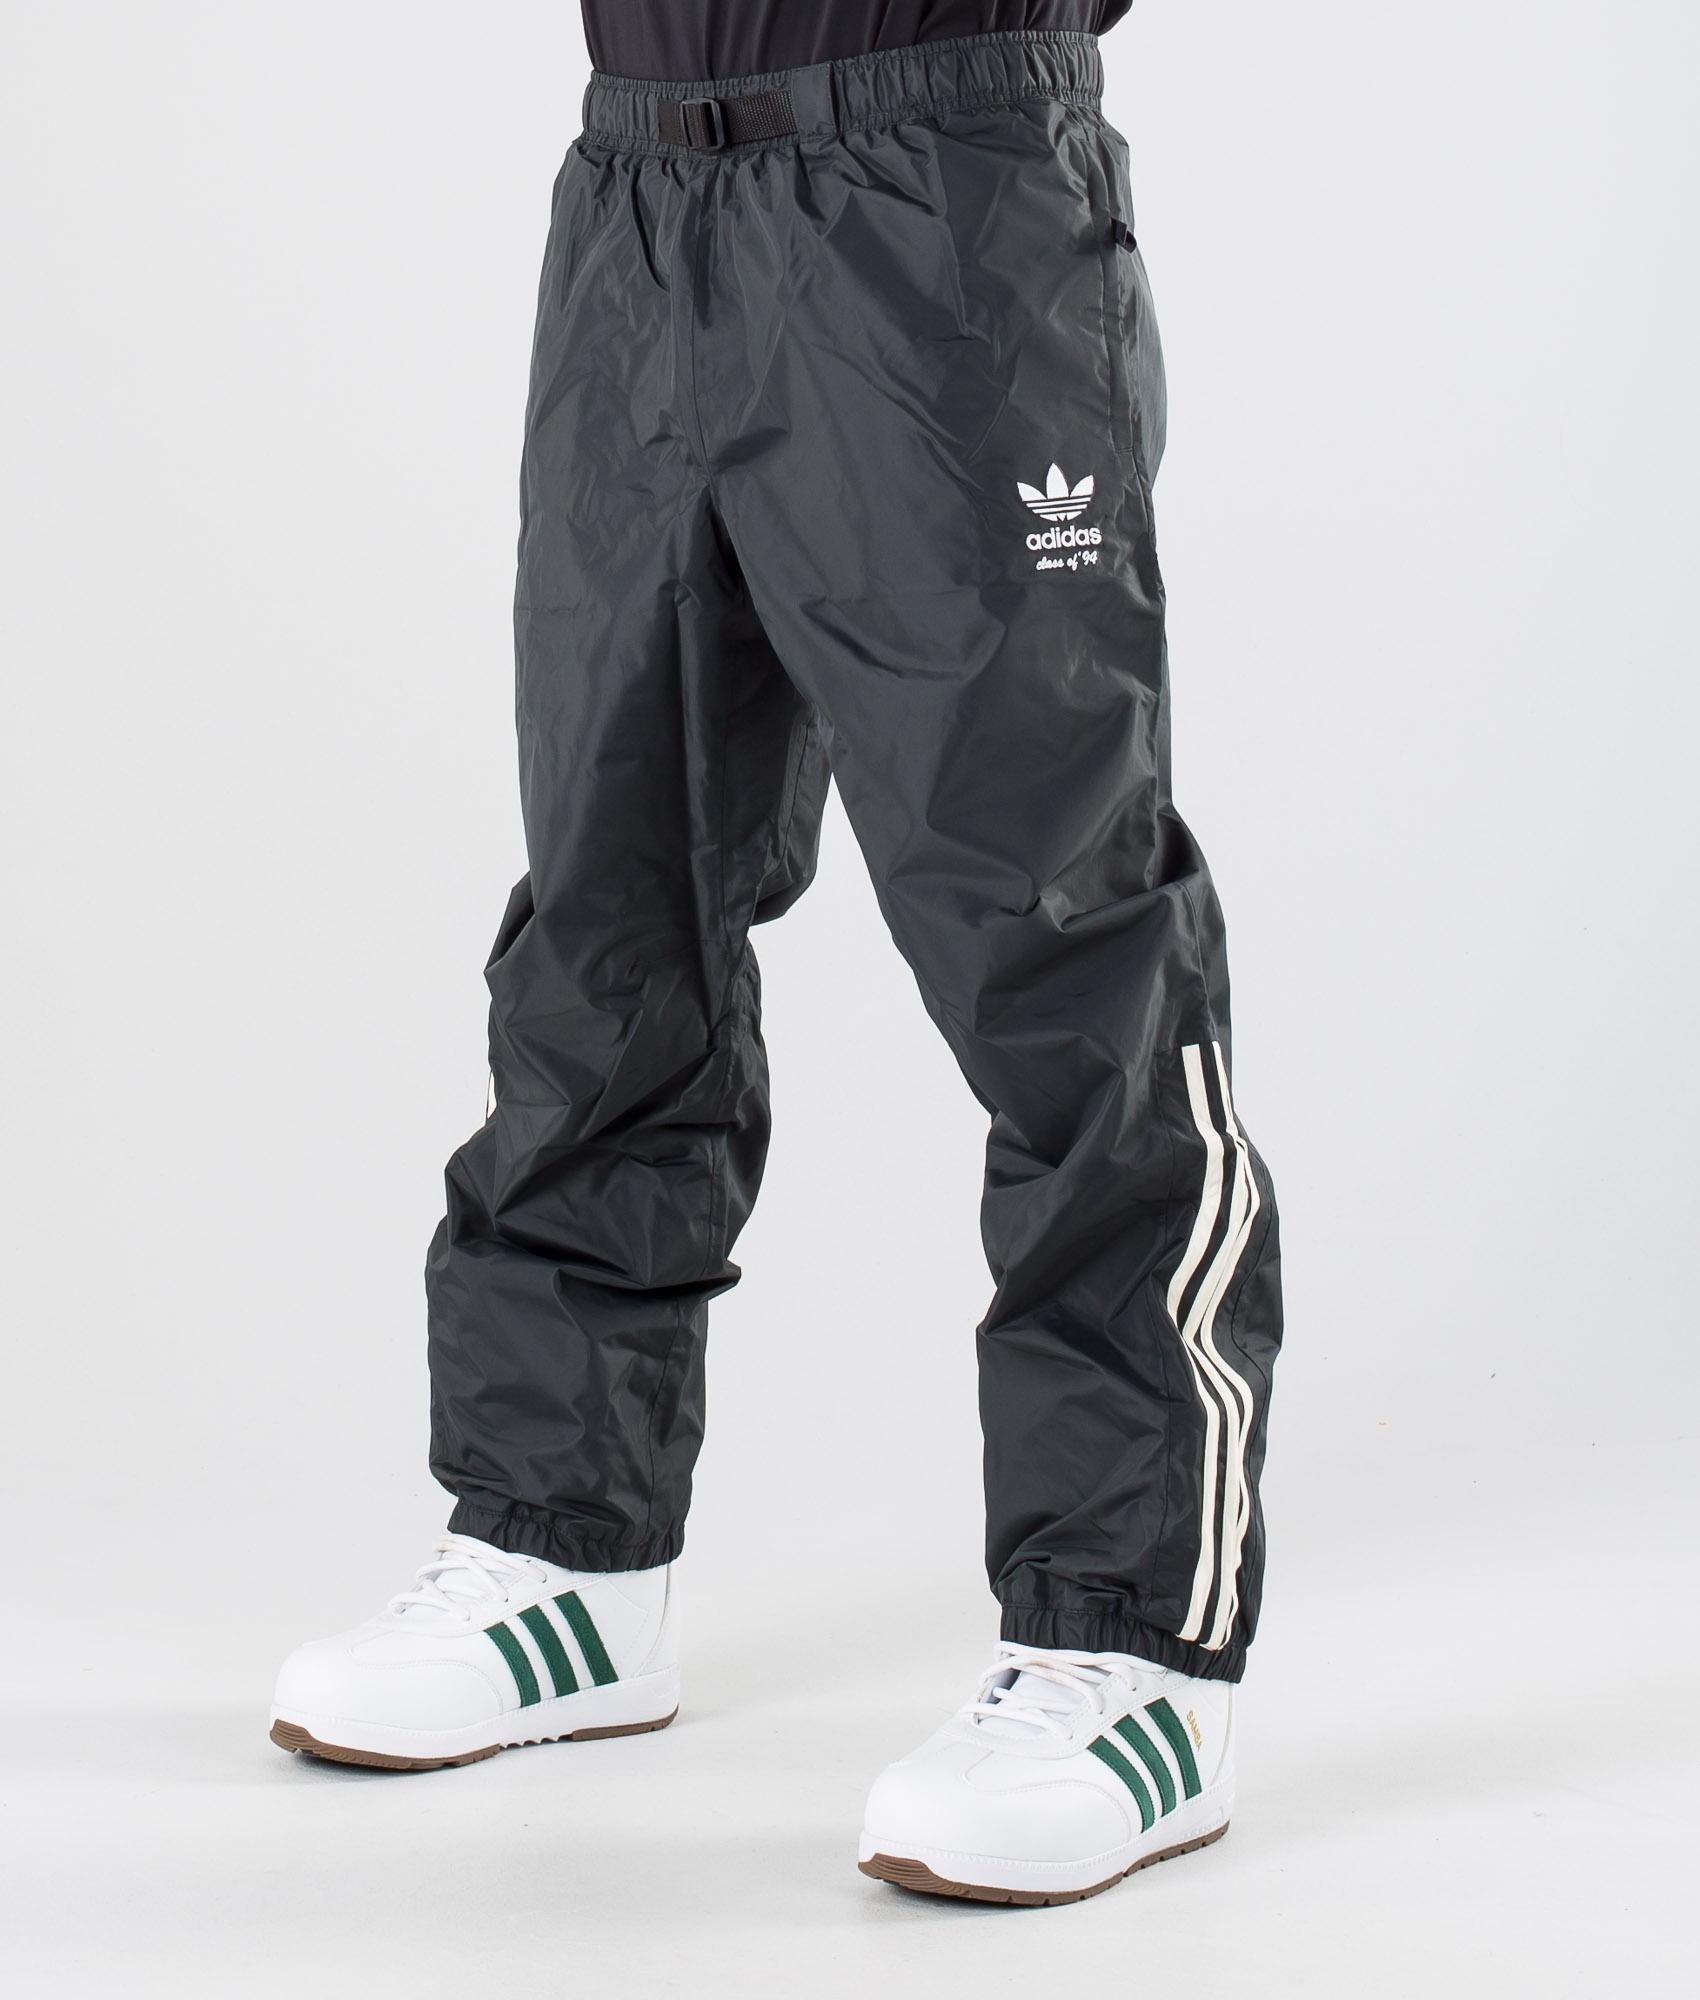 medio litro Mansedumbre Juramento  Adidas Snowboarding Comp Pantalon de Snowboard Carbon/Cream White/Active  Blue - Ridestore FR